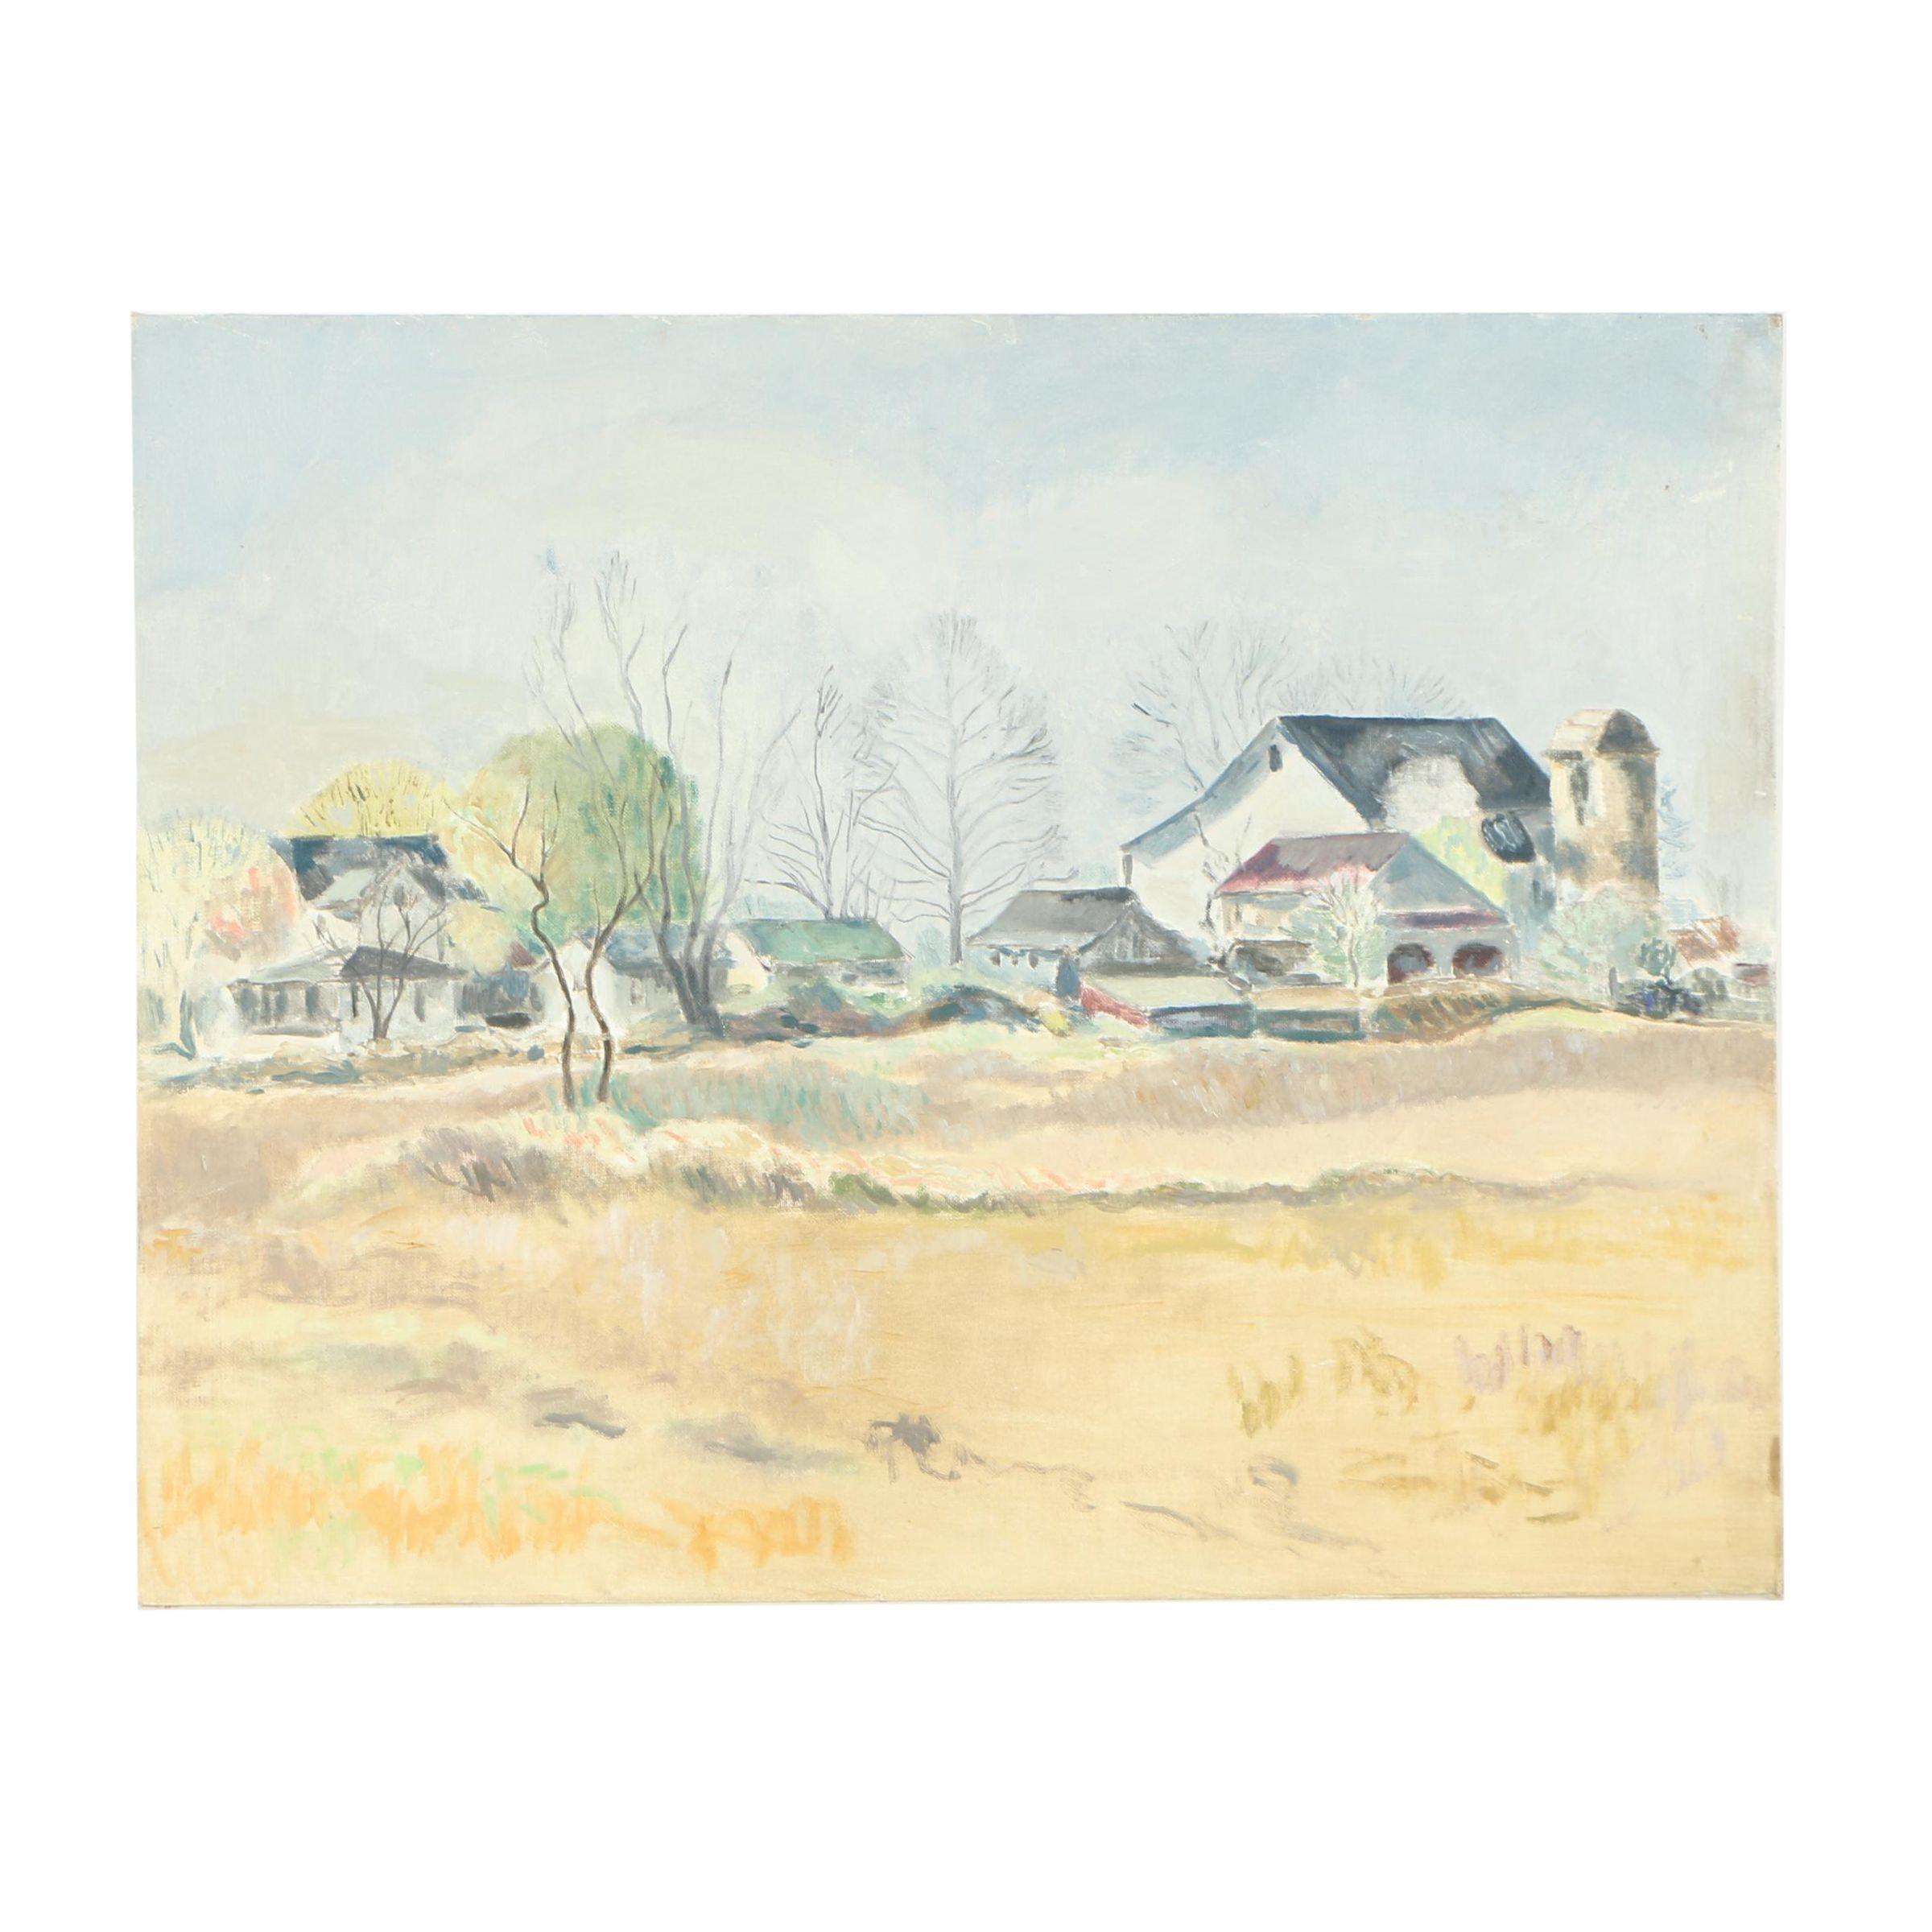 H. Wentz Oil Painting of Rural Community